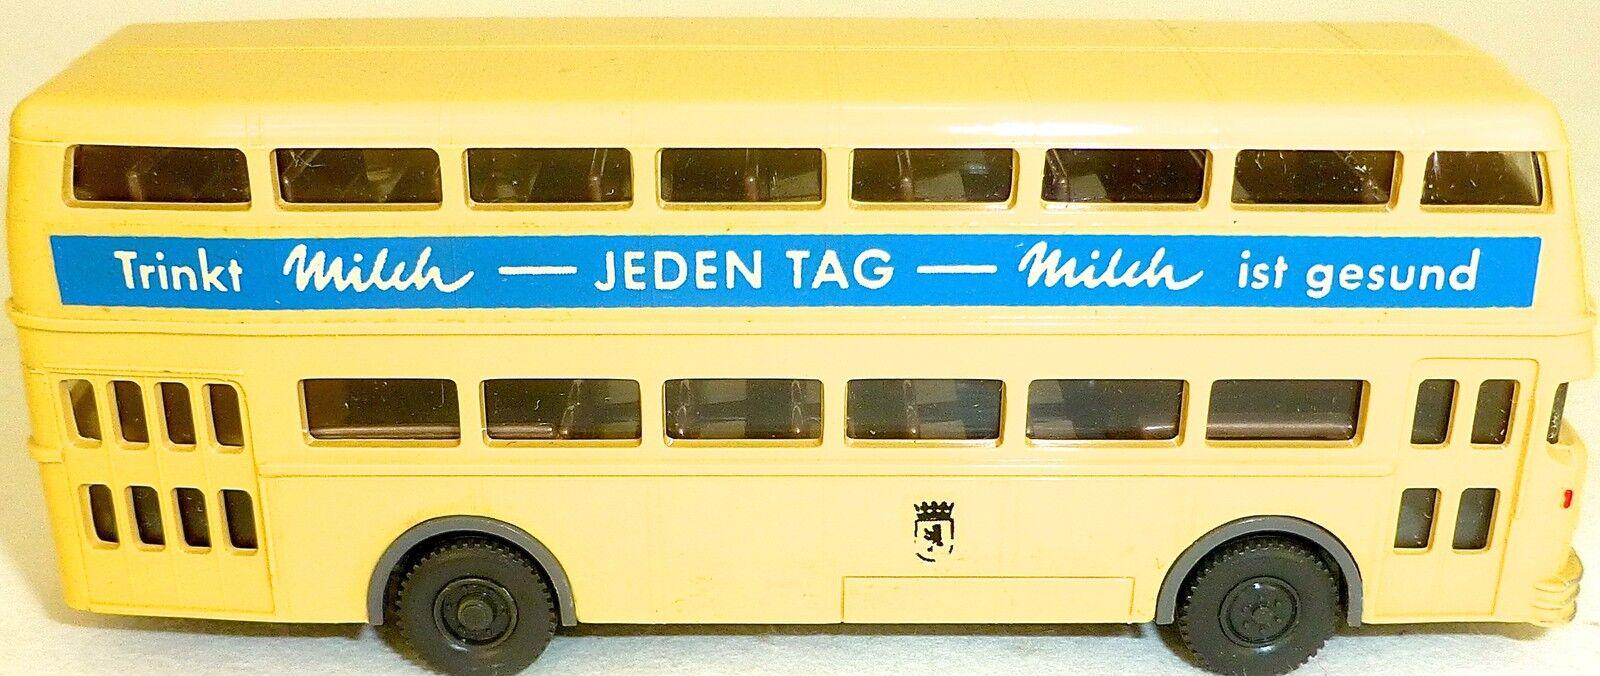 Latte potabile 66 werbebus d2u porta a Wiking h0 1:87 gd4 å